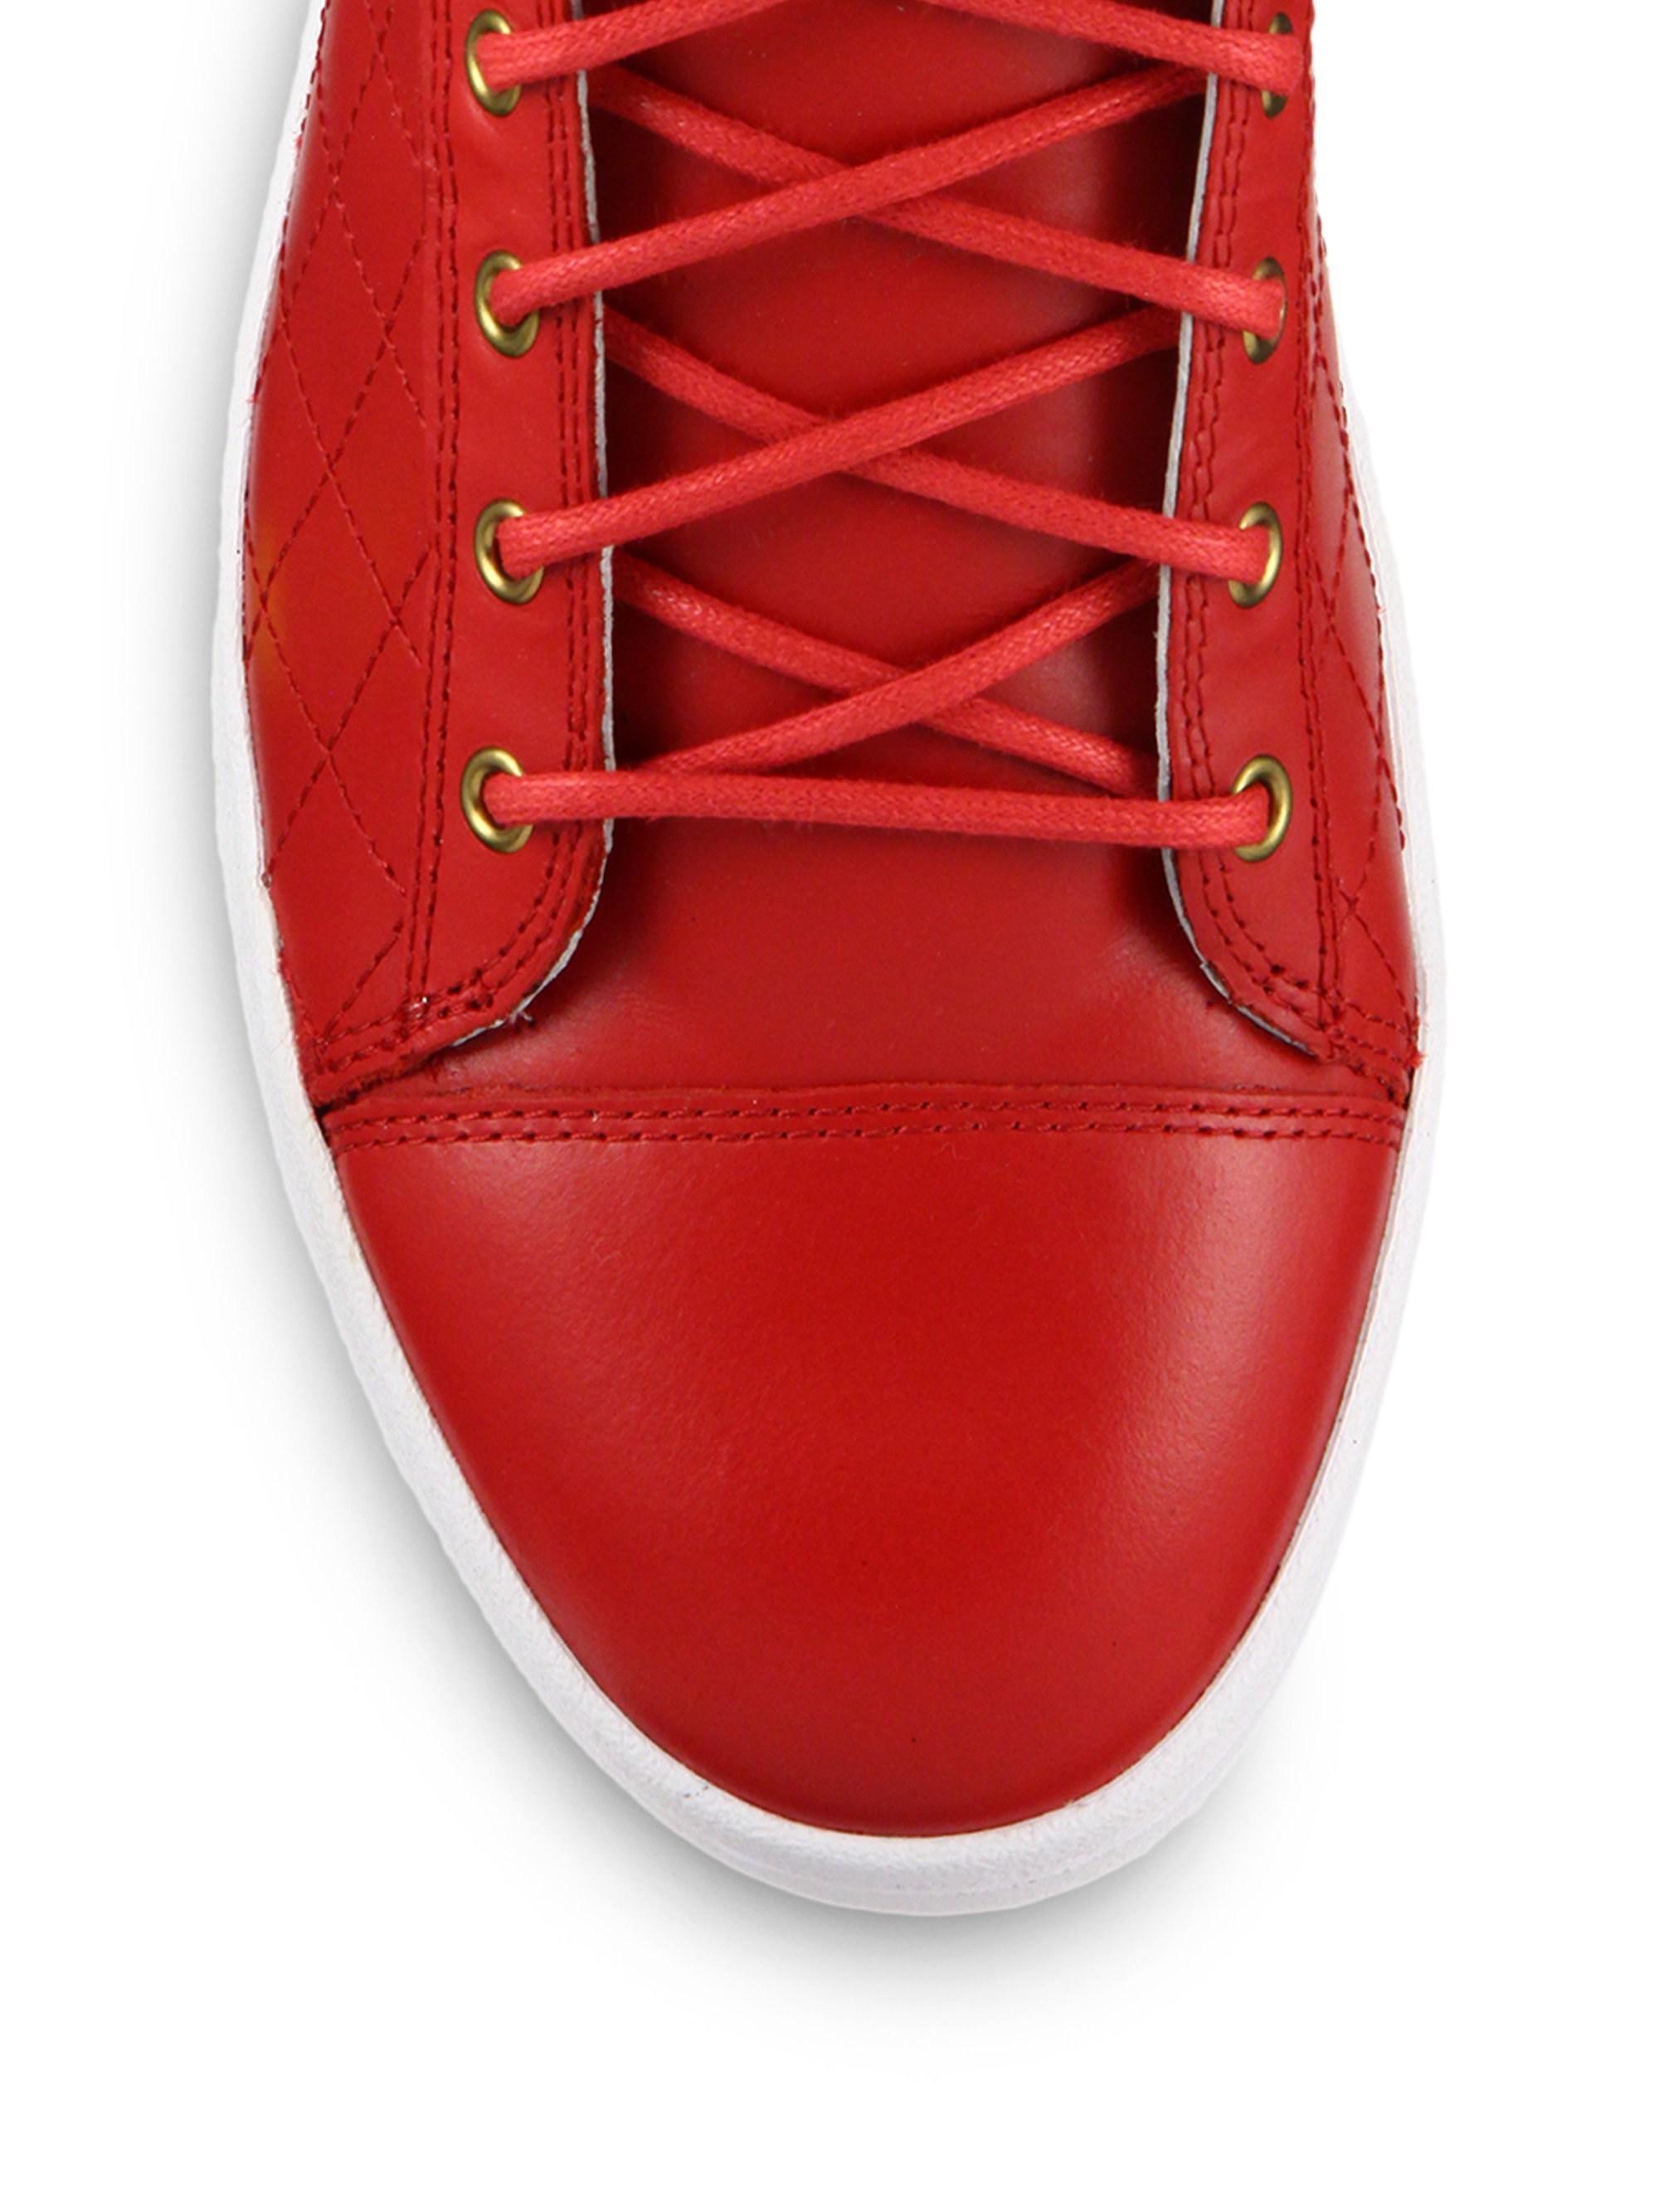 38c4170944 Lyst - DIESEL Tempus Diamond Leather High-top Sneakers in Red for Men